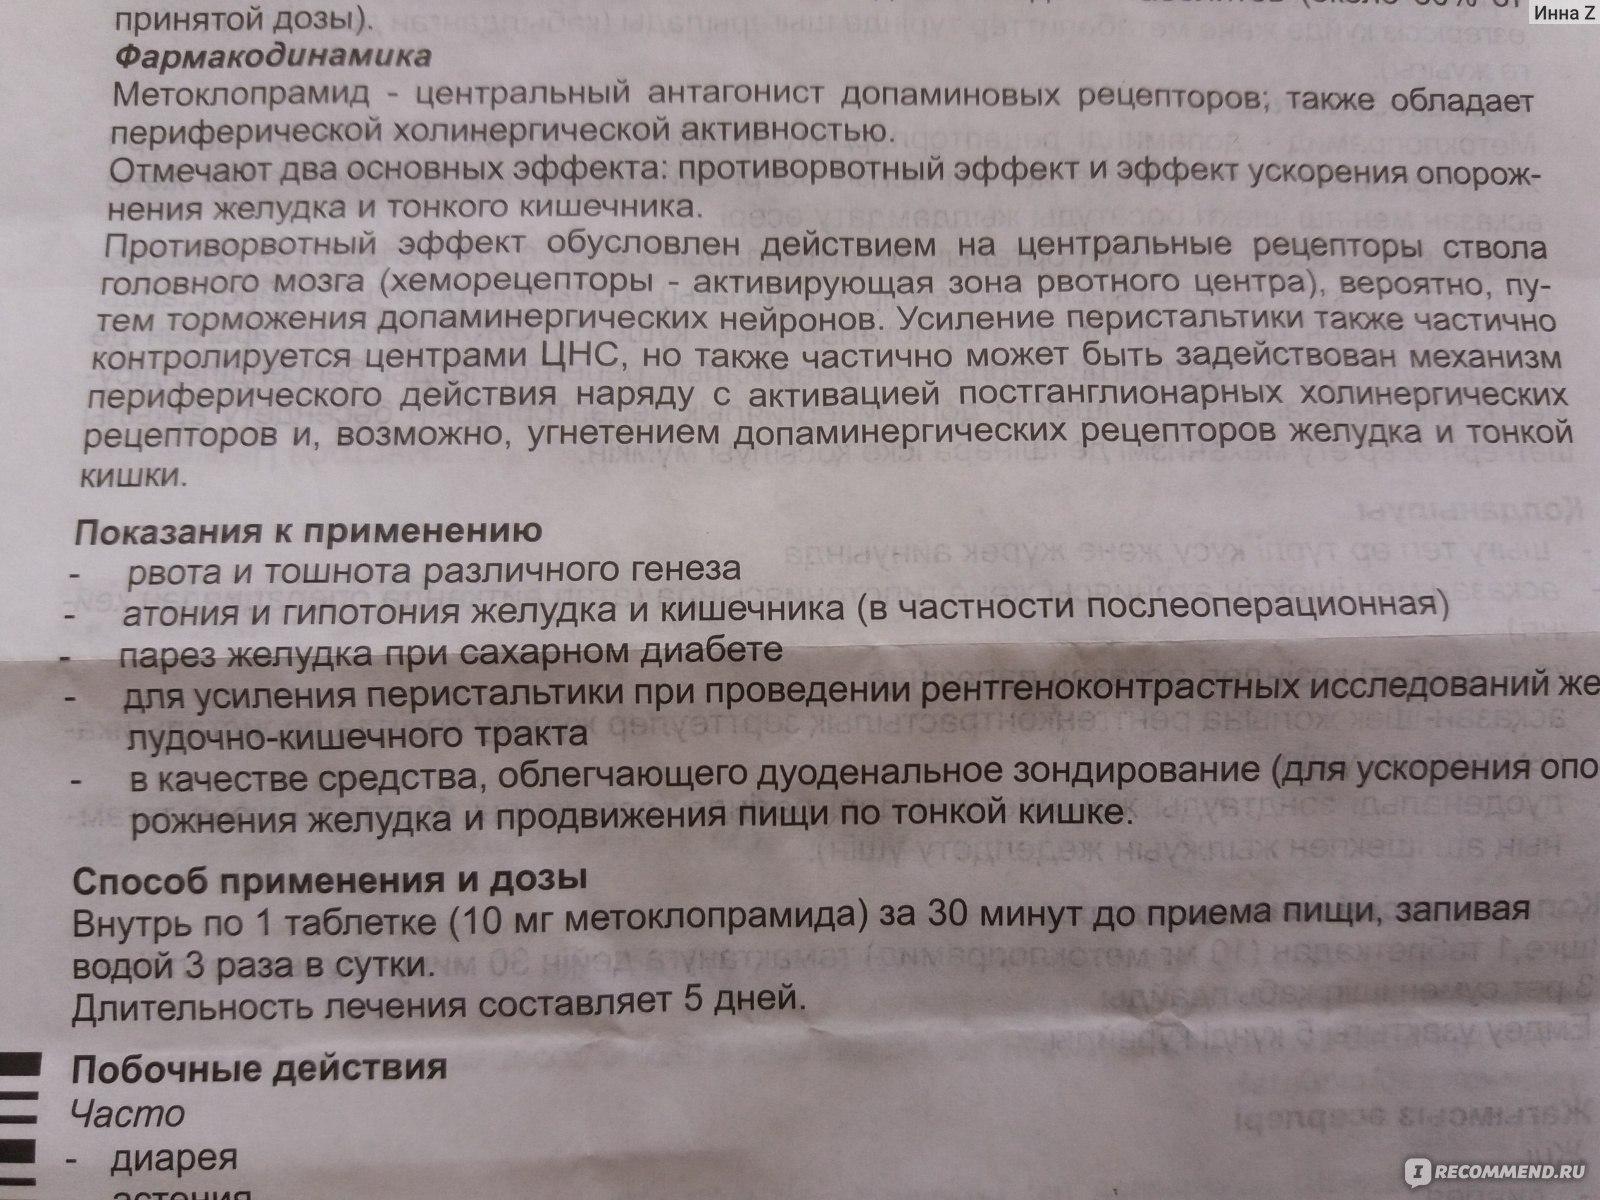 Церукал от тошноты и рвоты у детей, дозировка препарата / mama66.ru